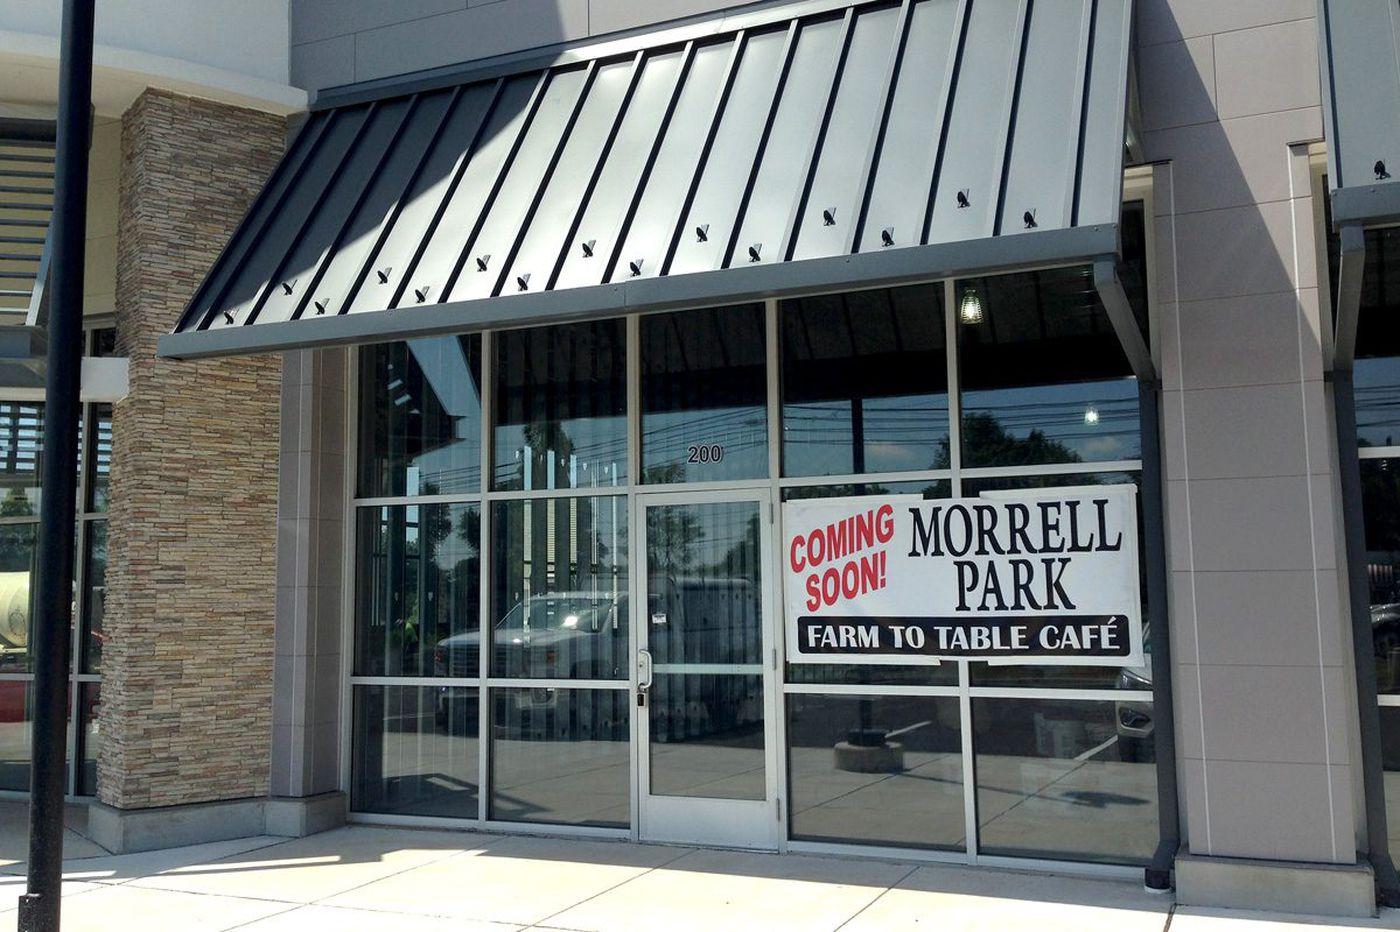 Morrell Park, a BYOB, to open near Phoenixville